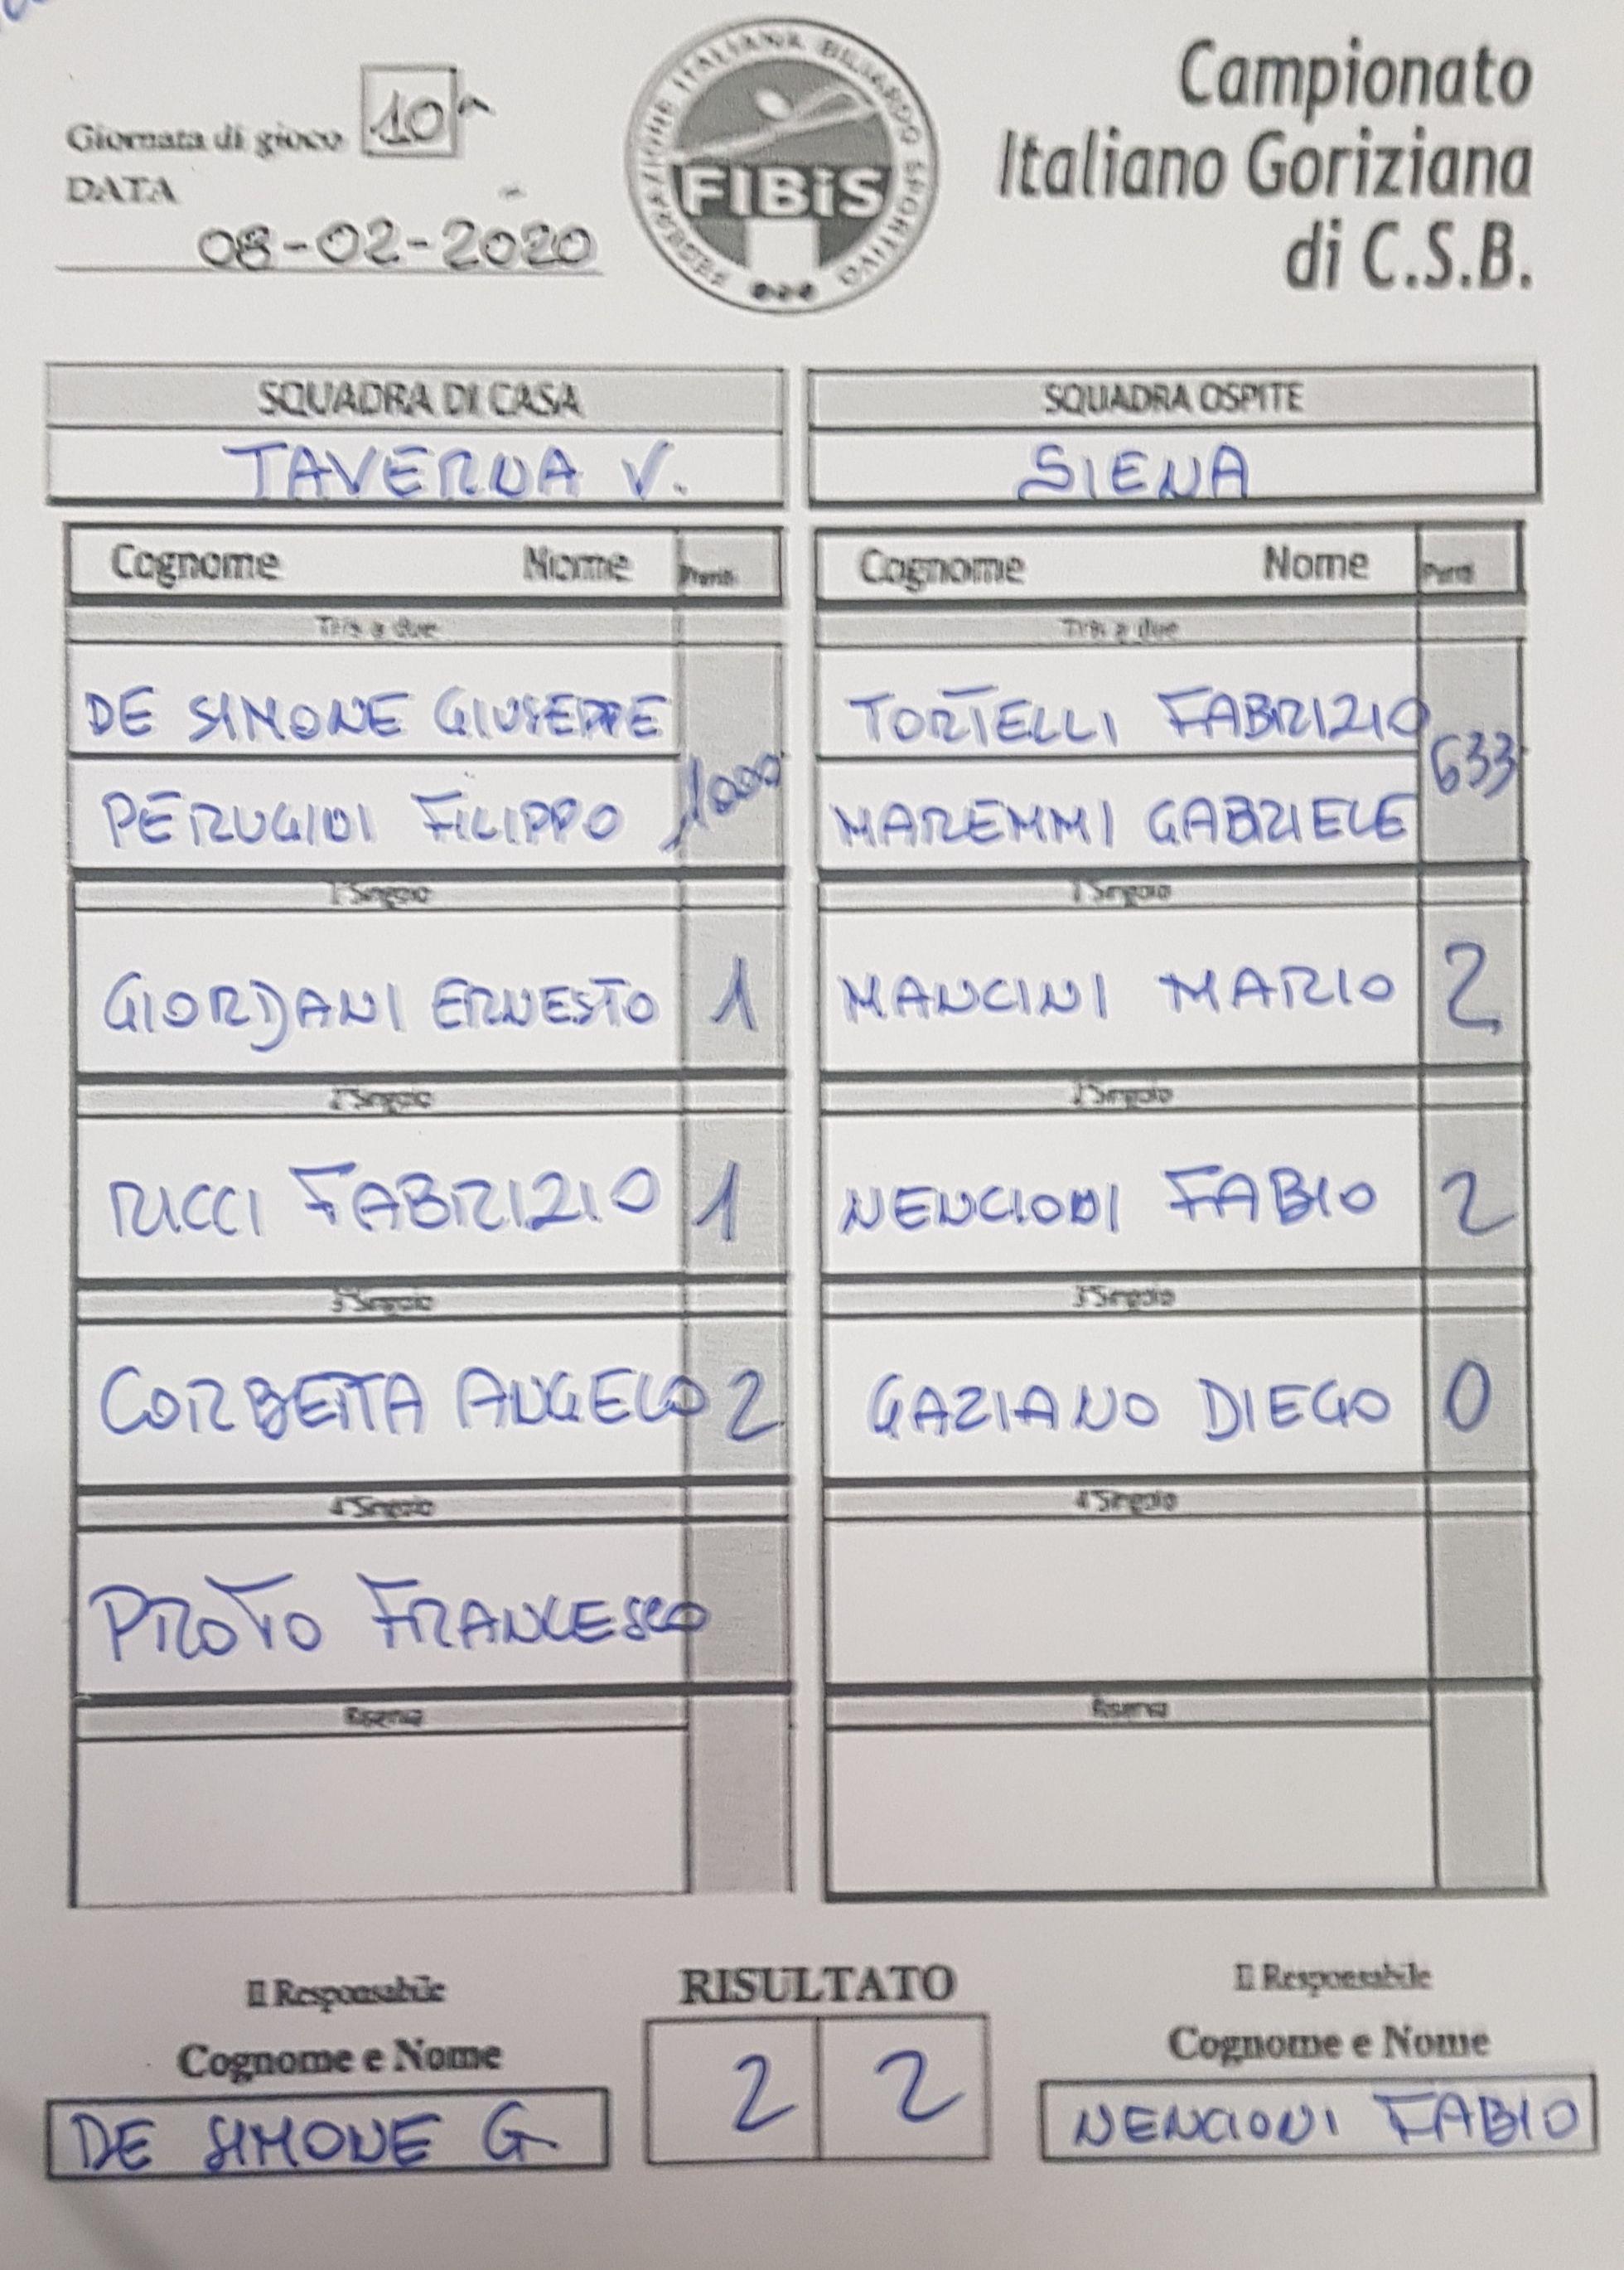 Taverna vs Siena